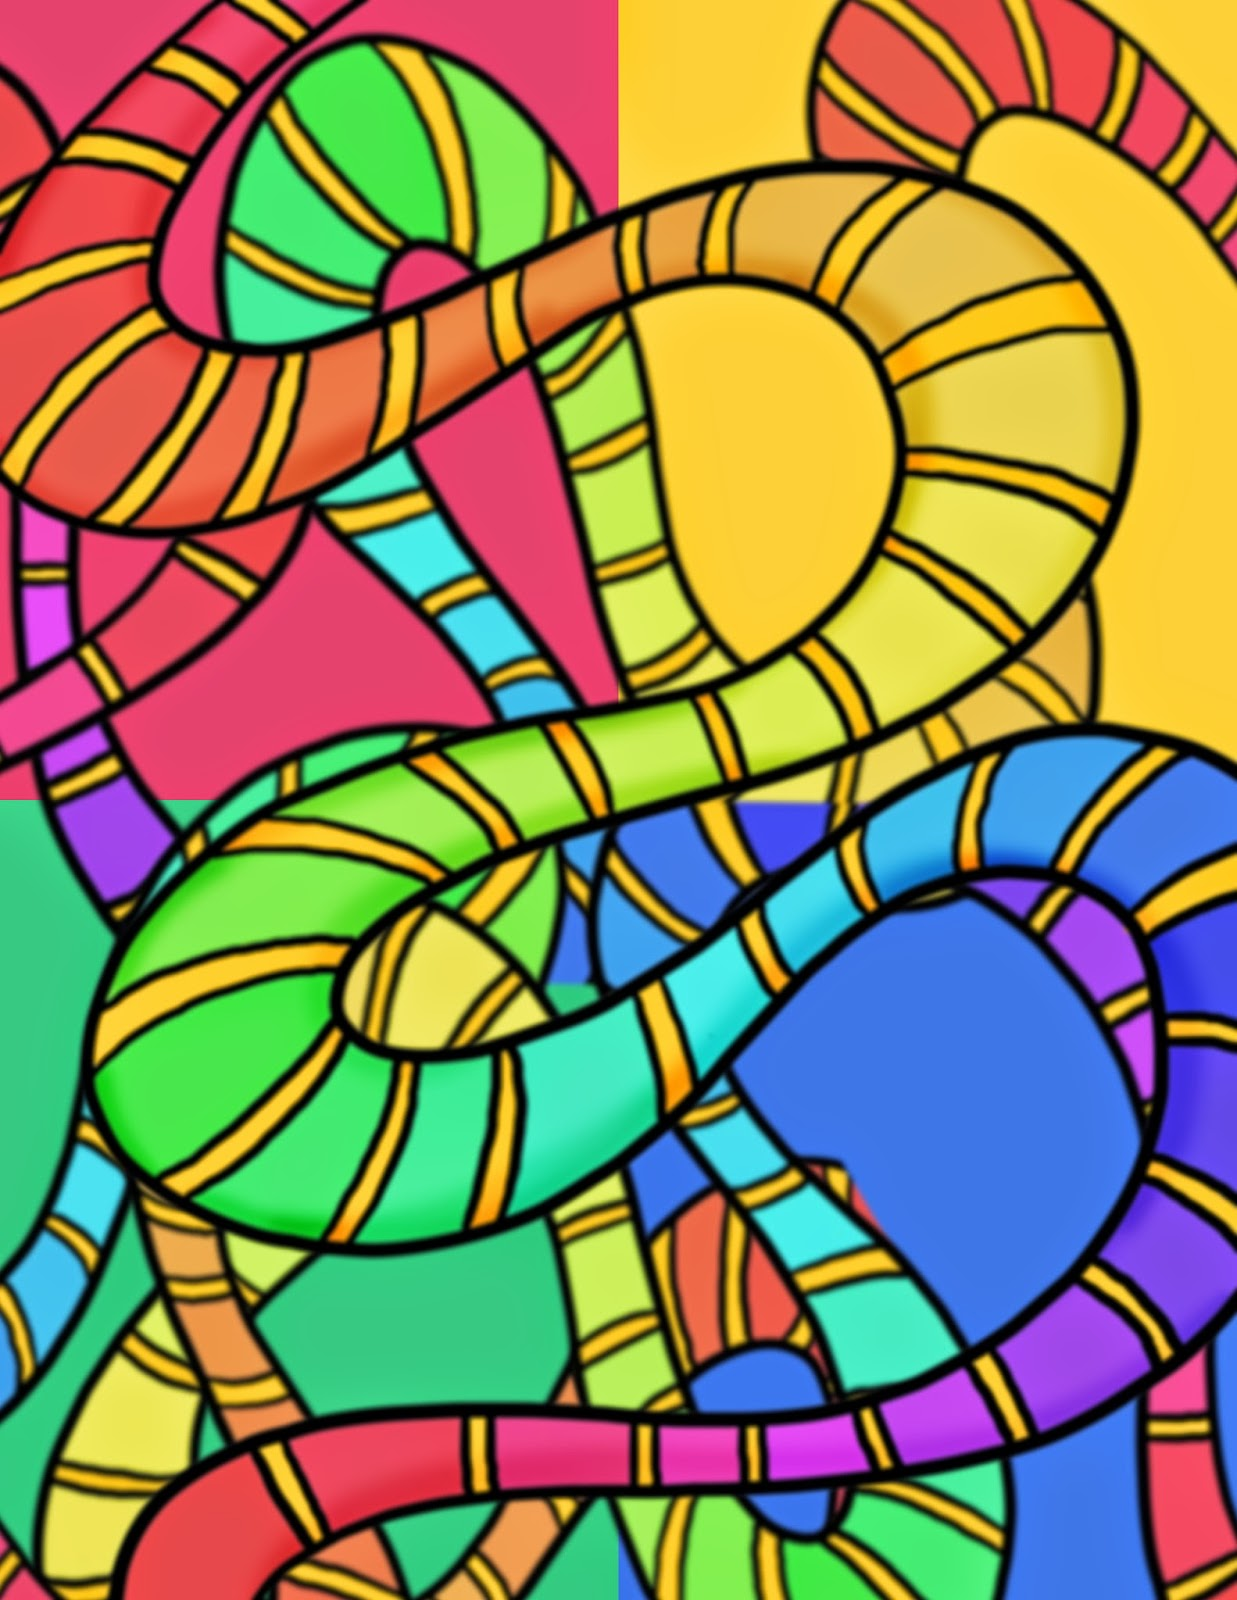 Ragam Hias Abstrak : ragam, abstrak, World, Zahra:, Motif, Ragam, Nusantara